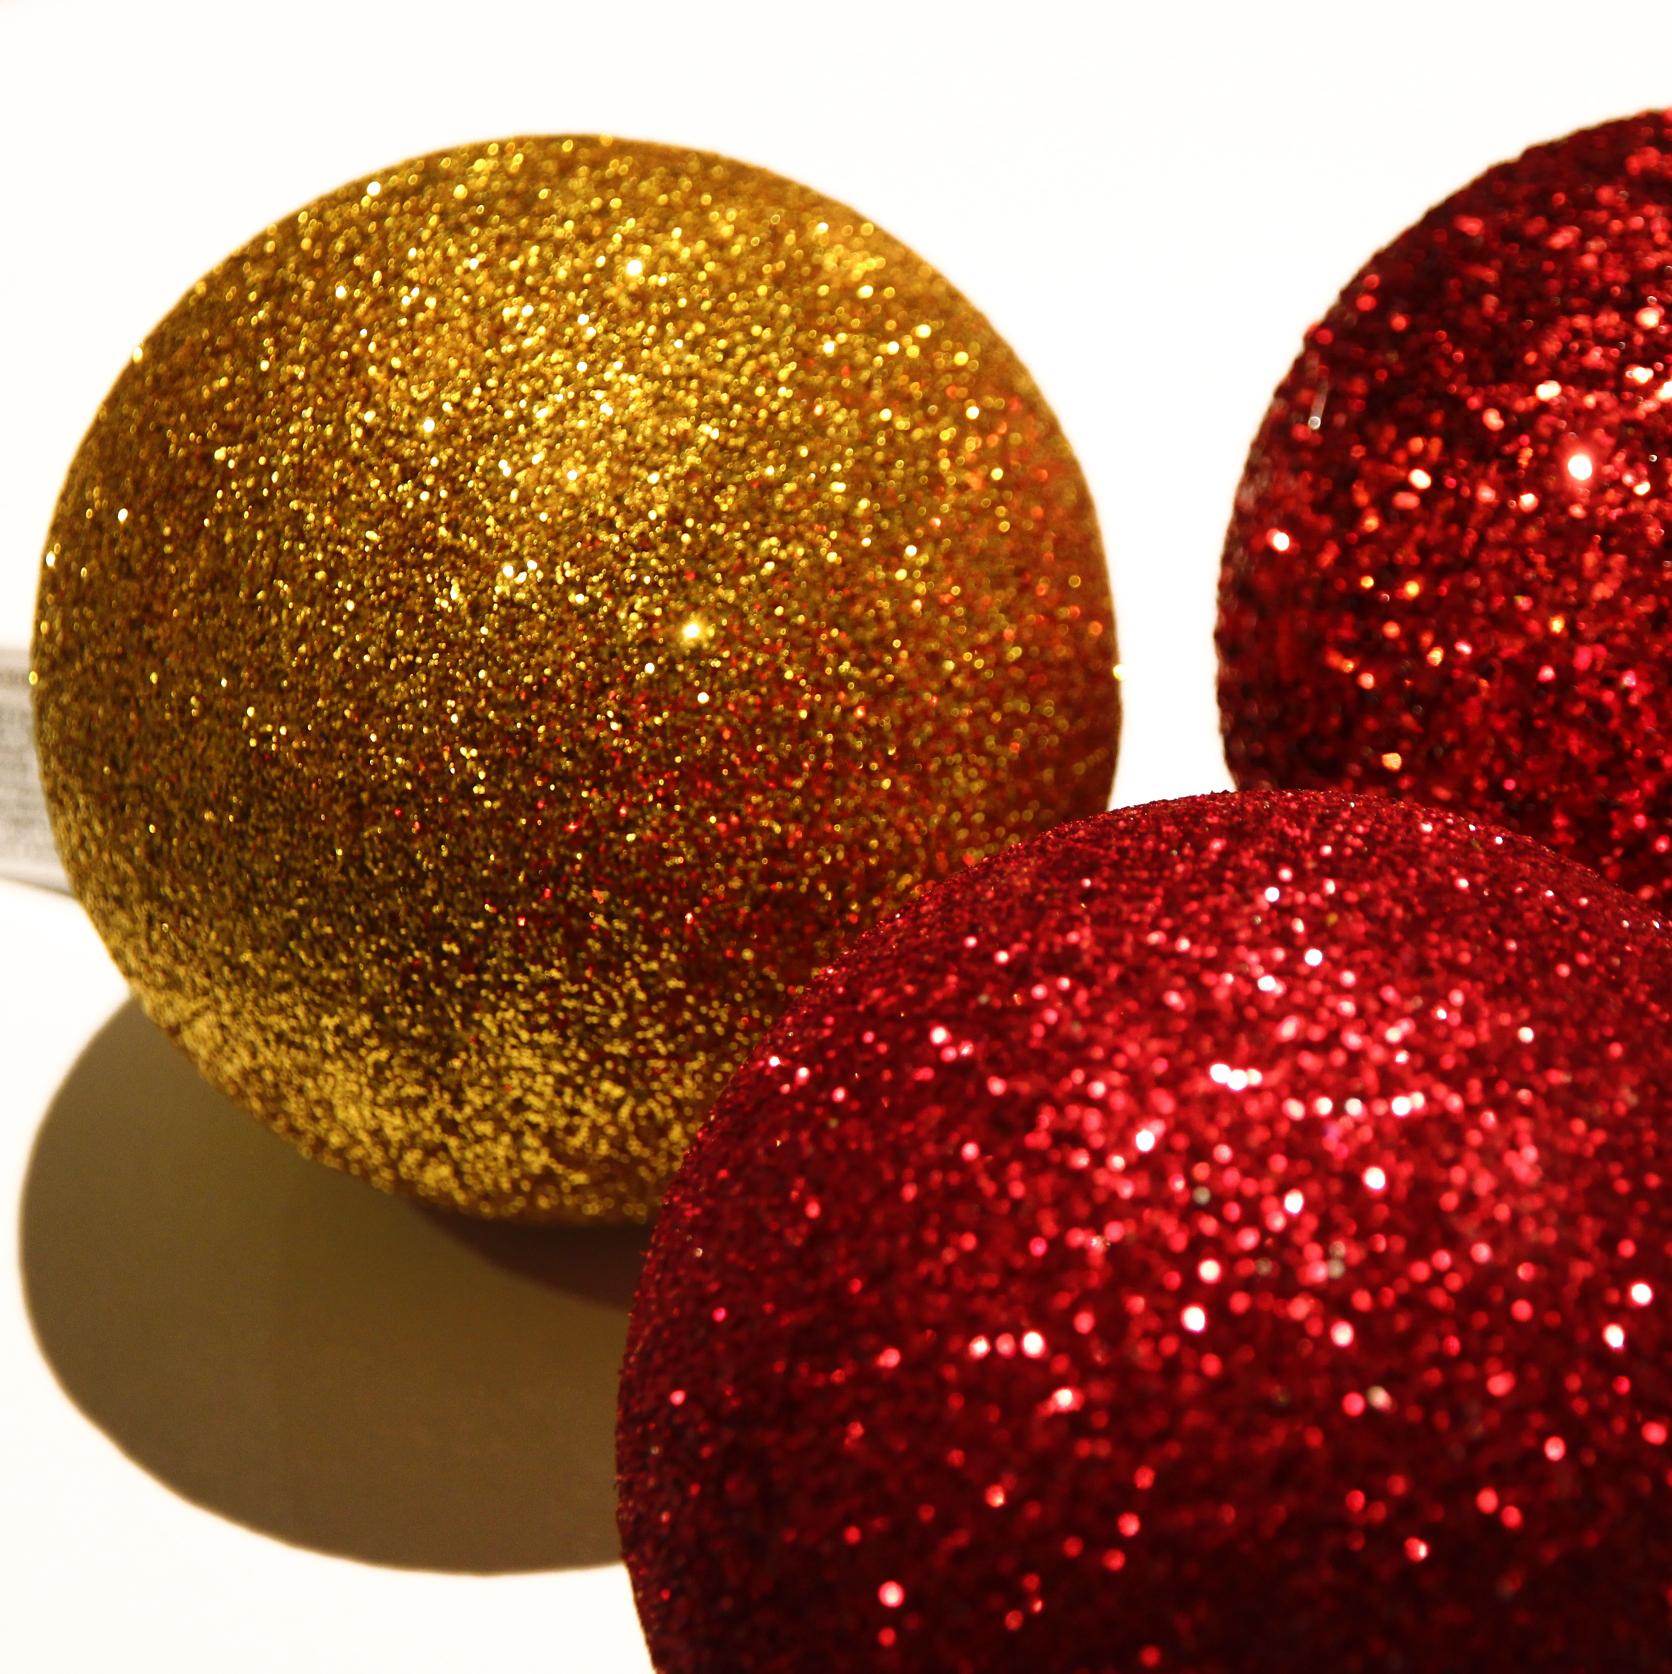 шары из пенопласта,  шары новогодние из пенопласта